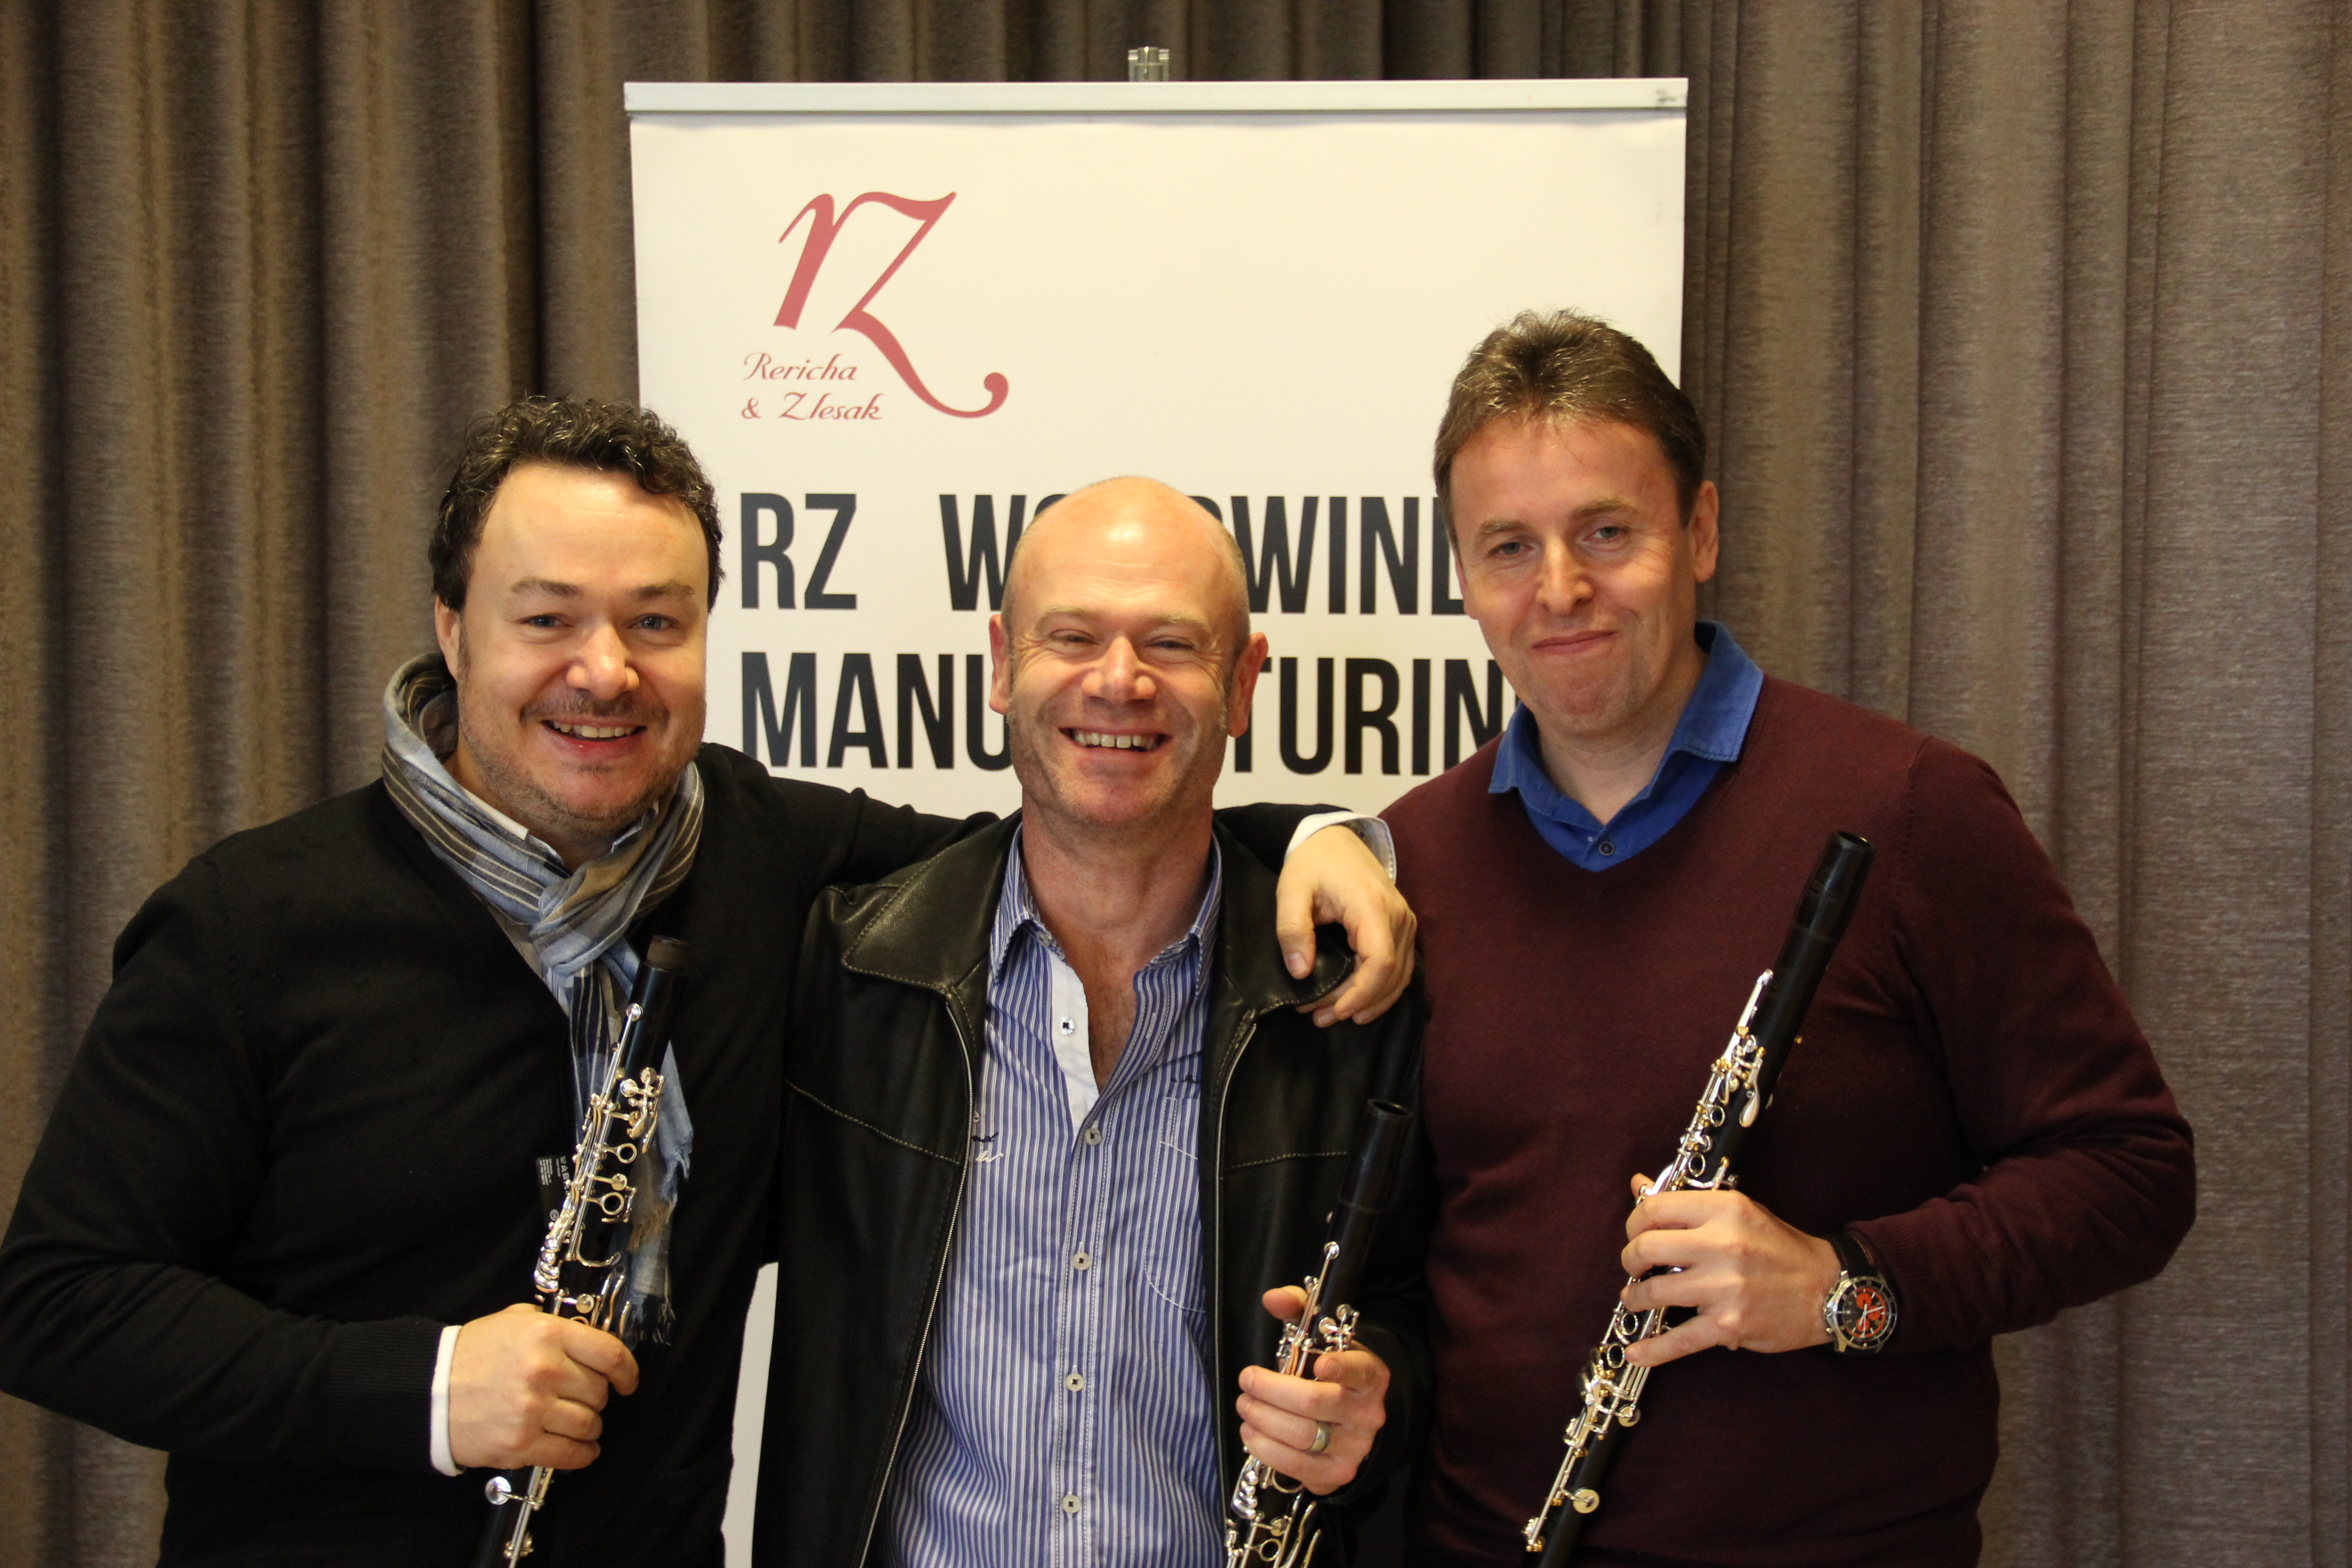 Milan Rericha & Roman Zlesak, RZ-Clarinets